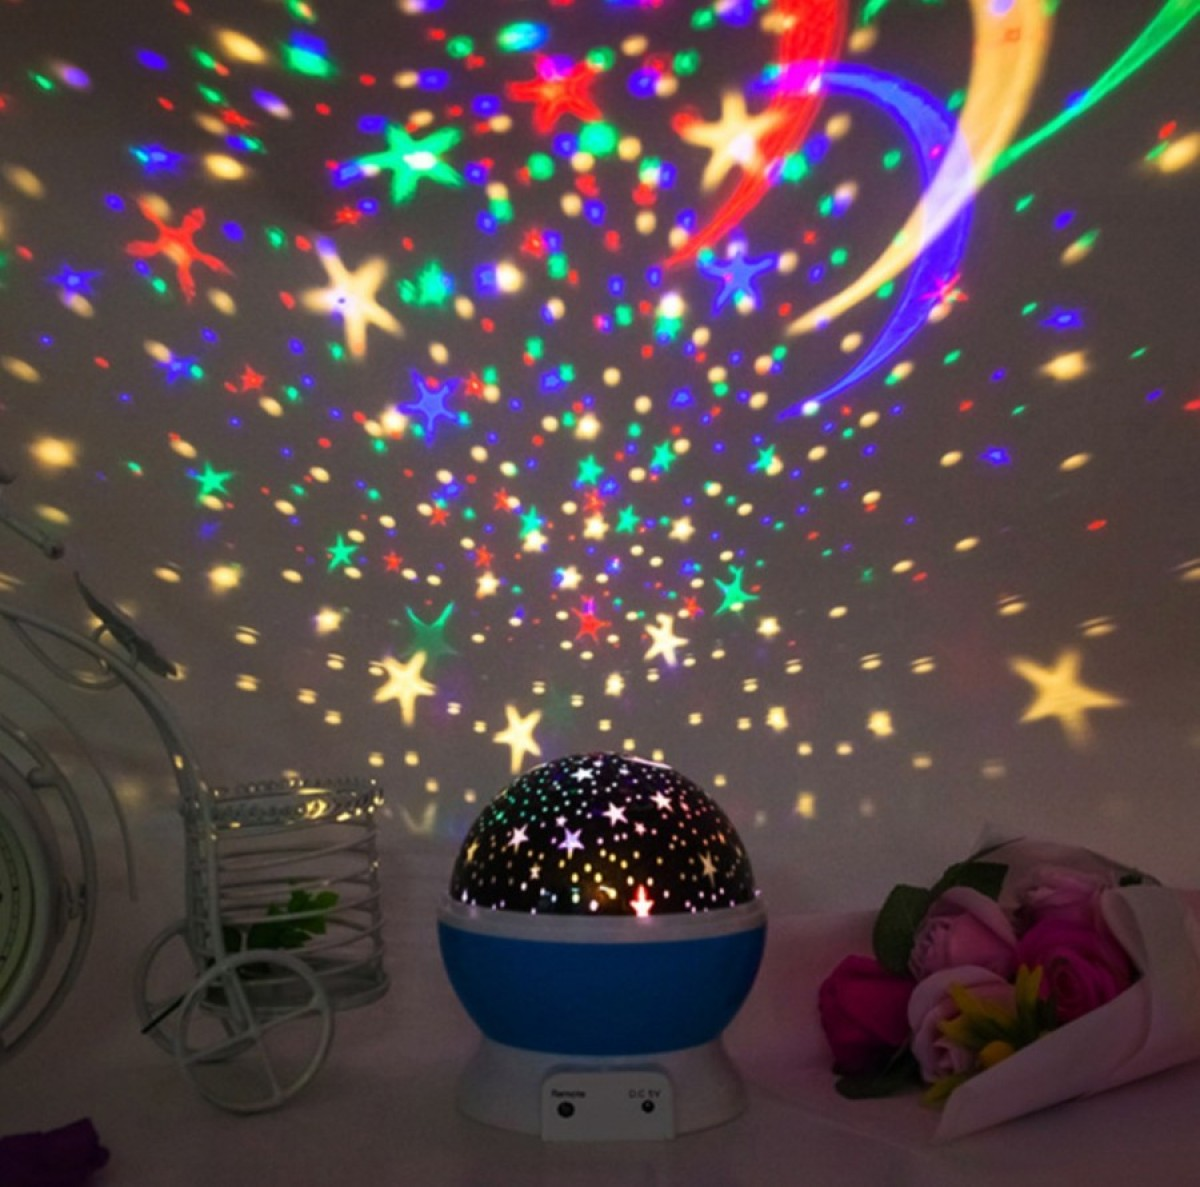 Lampu tidur proyektor Bulat 1027a motif bulan bintang Dream - Bunda Ina Shop